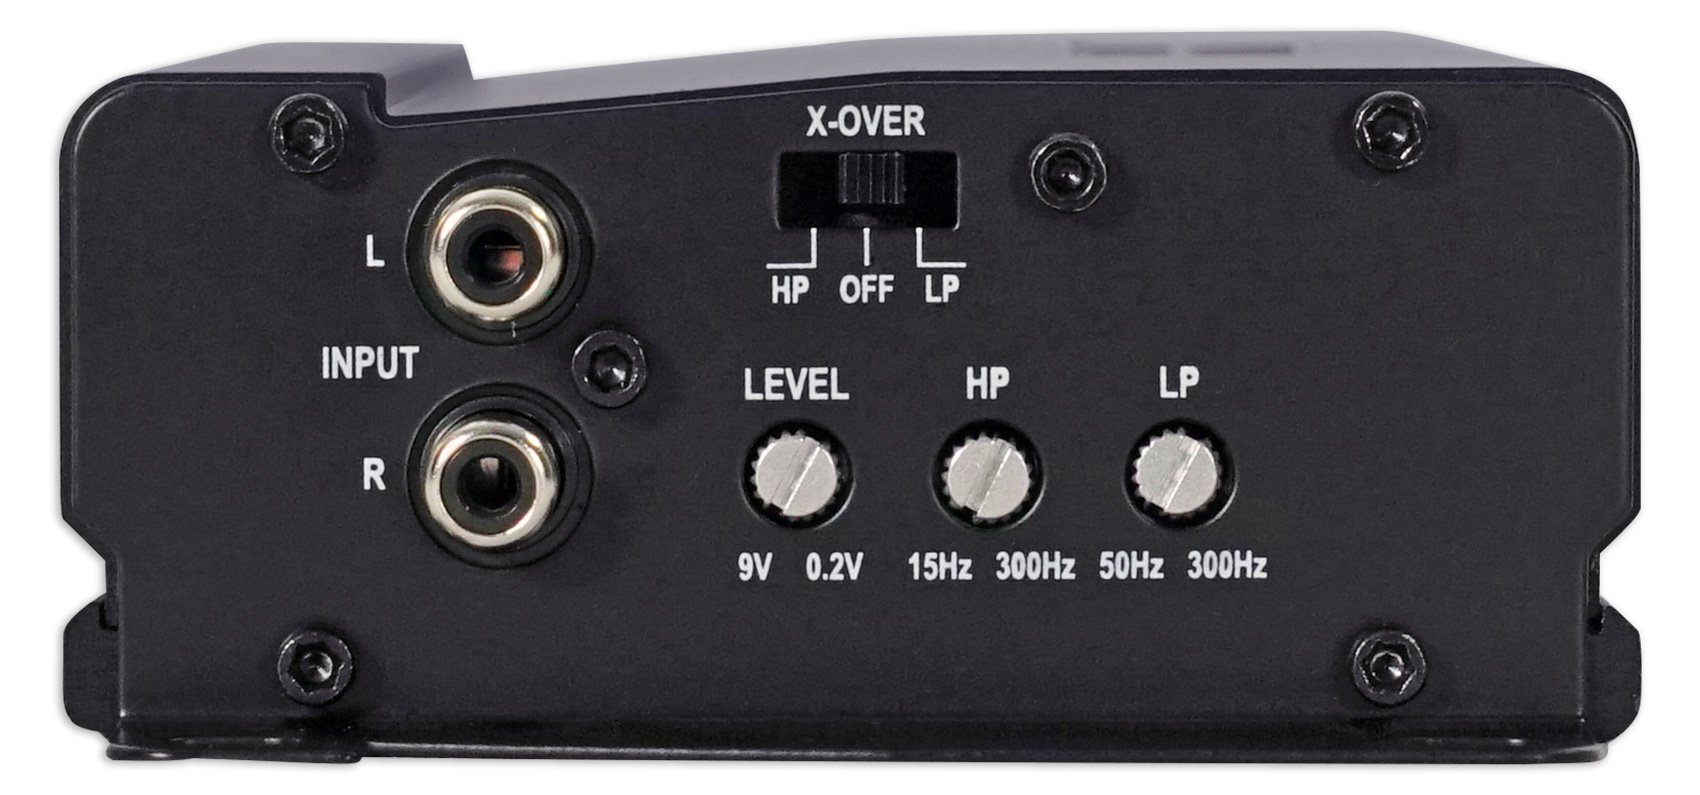 MB QUART NA2-400.2 400w 2-Channel Amplifier Amp For Polaris/ATV/UTV/RZR/CART by MB Quart (Image #3)